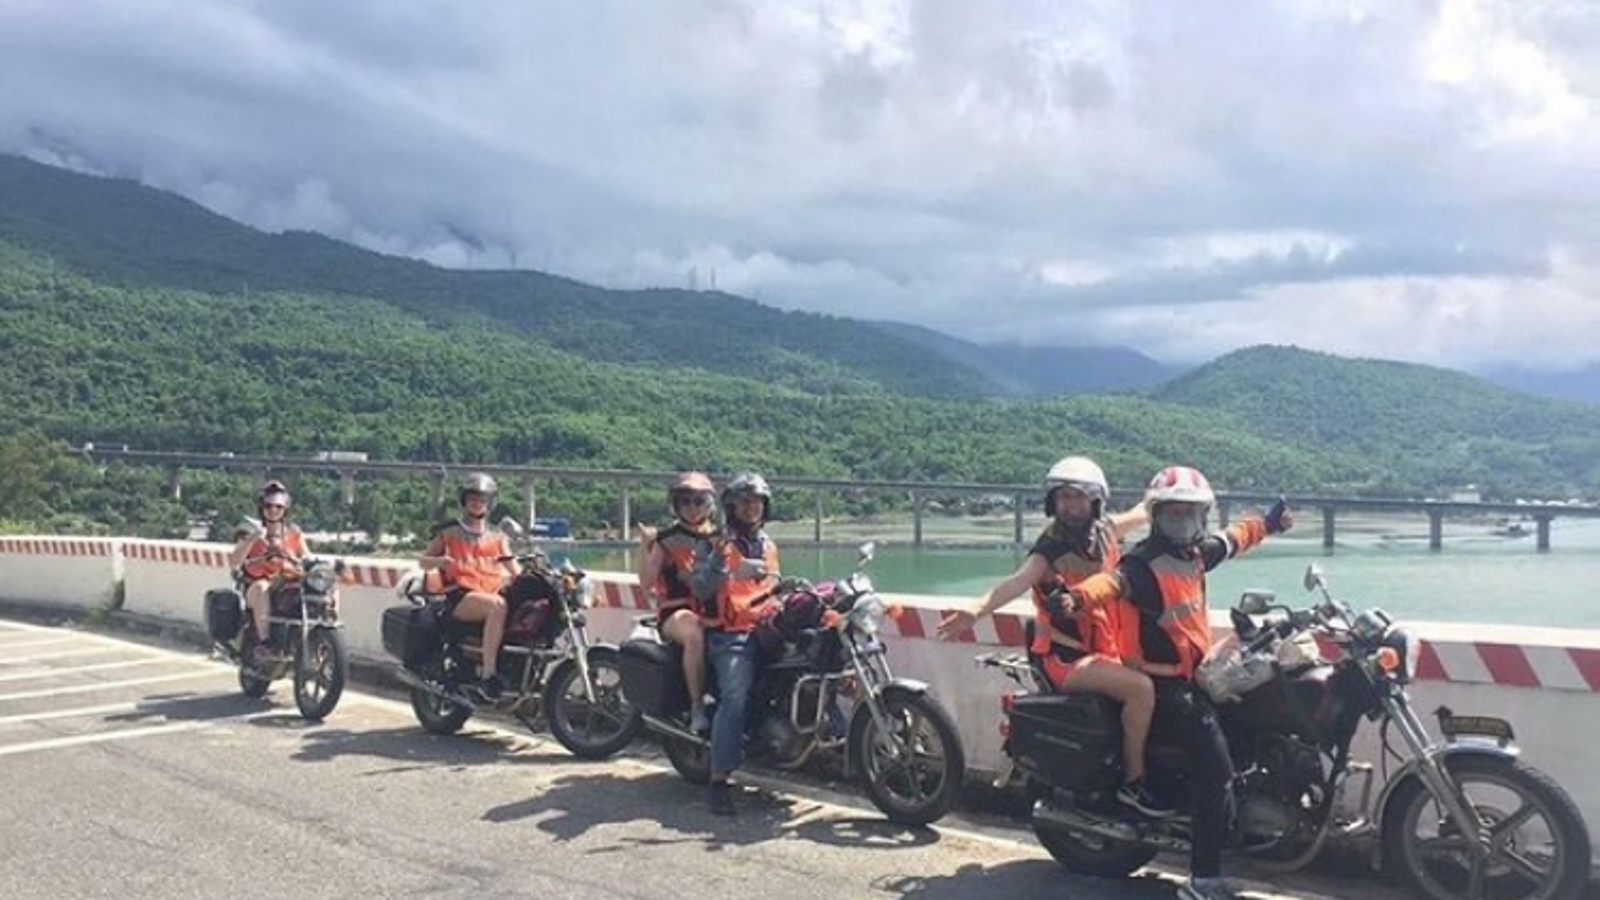 TripAdvisor names two VN travel experiences among world's best